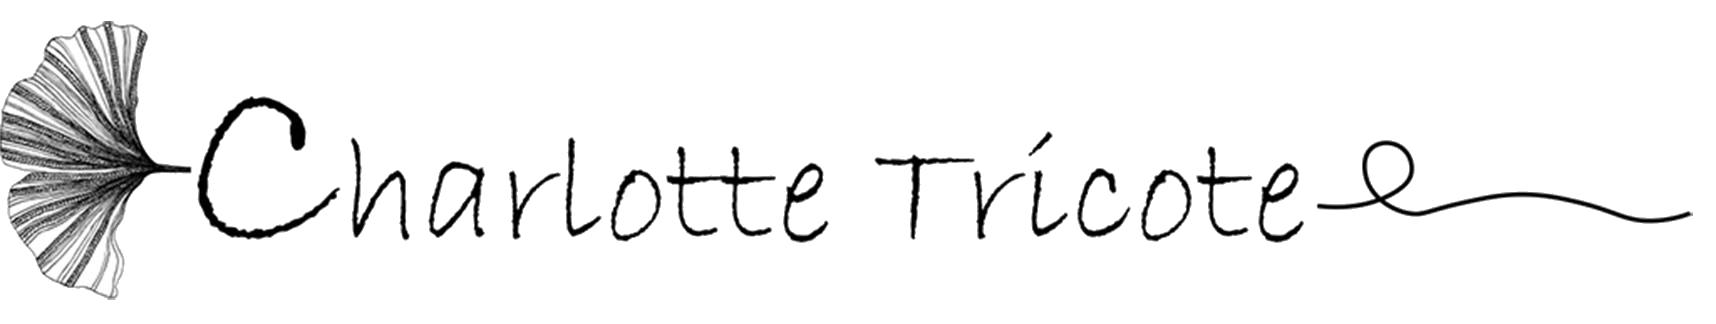 logo charlotte Tricote site test